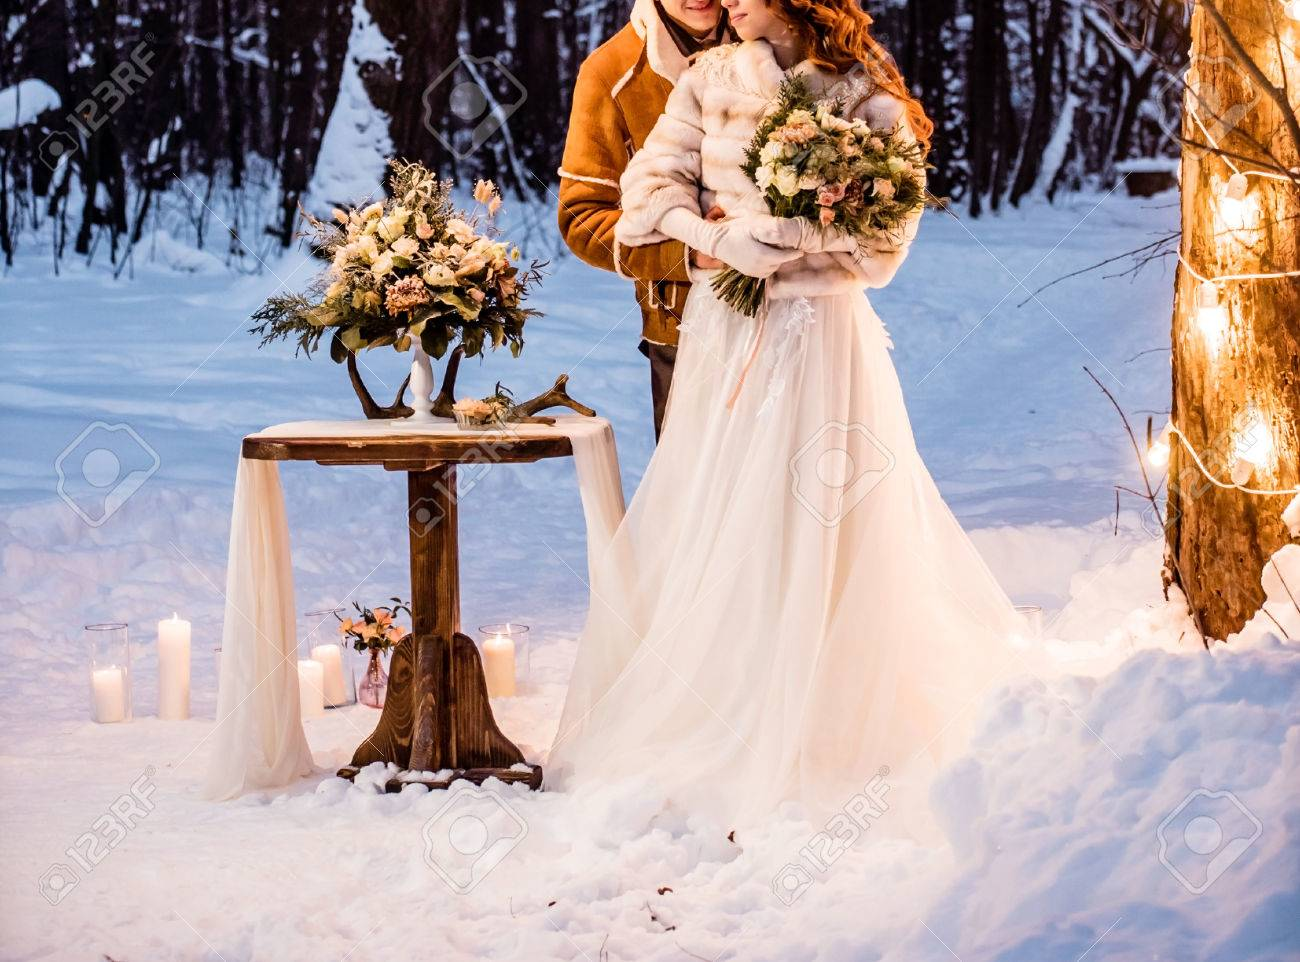 winter wedding - 53116387